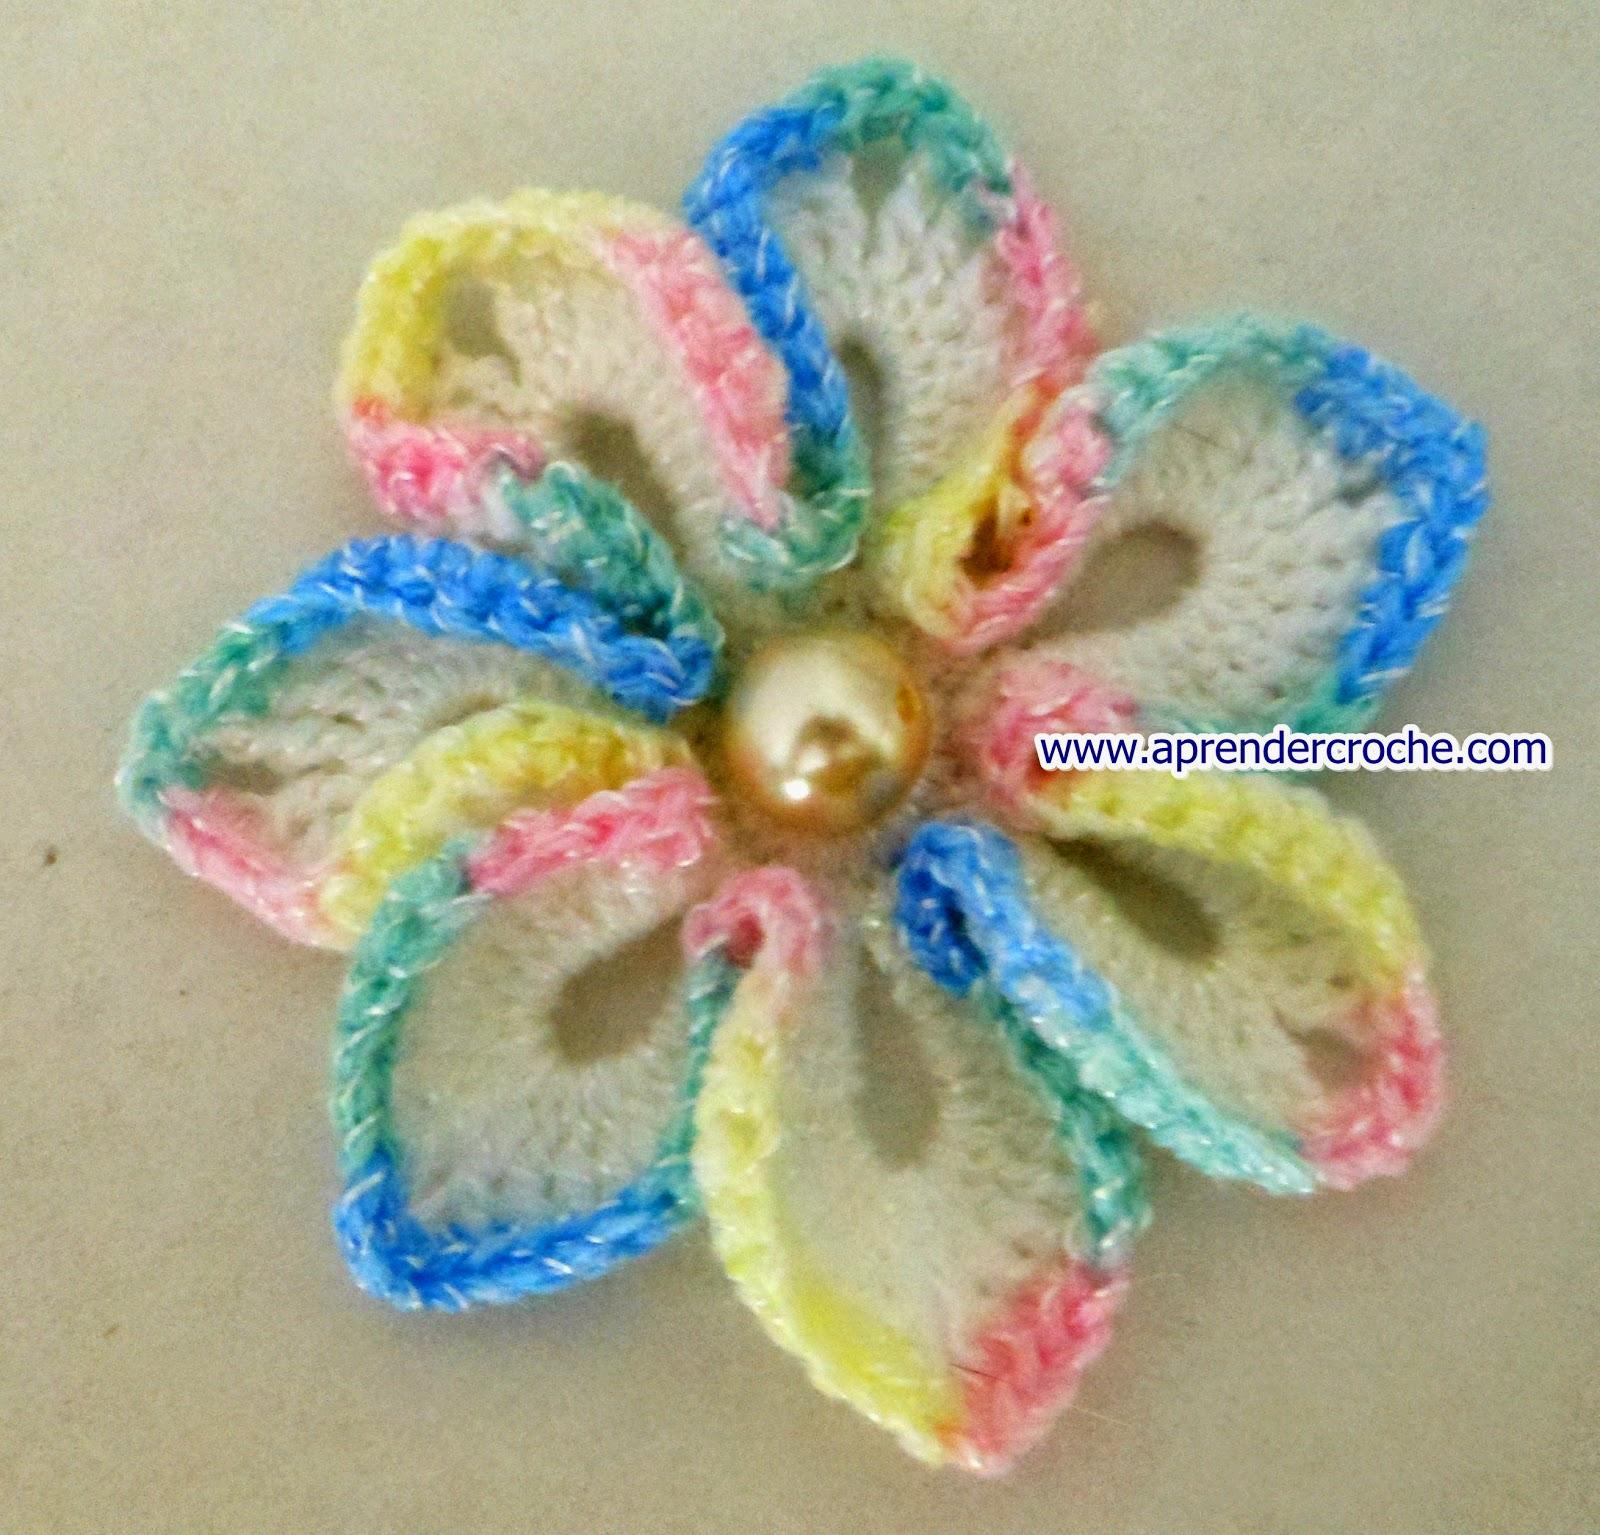 aprender croche flores inverno baby pantufas dvd video-aulas gratis loja curso de croche frete gratis